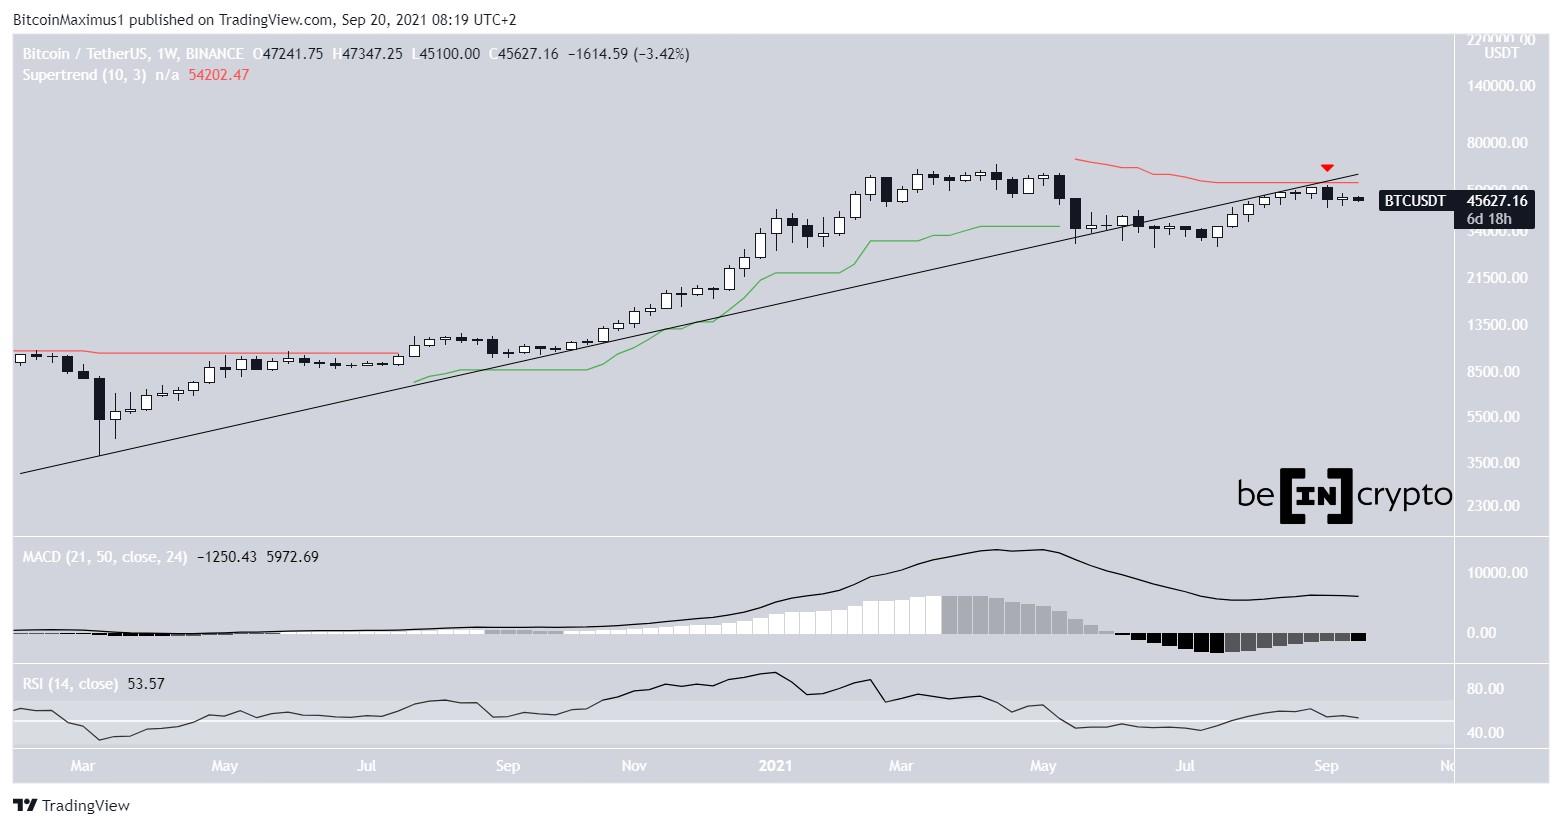 Bitcoin Kurs Preis Chart BTC 20. September 2021 Prognose